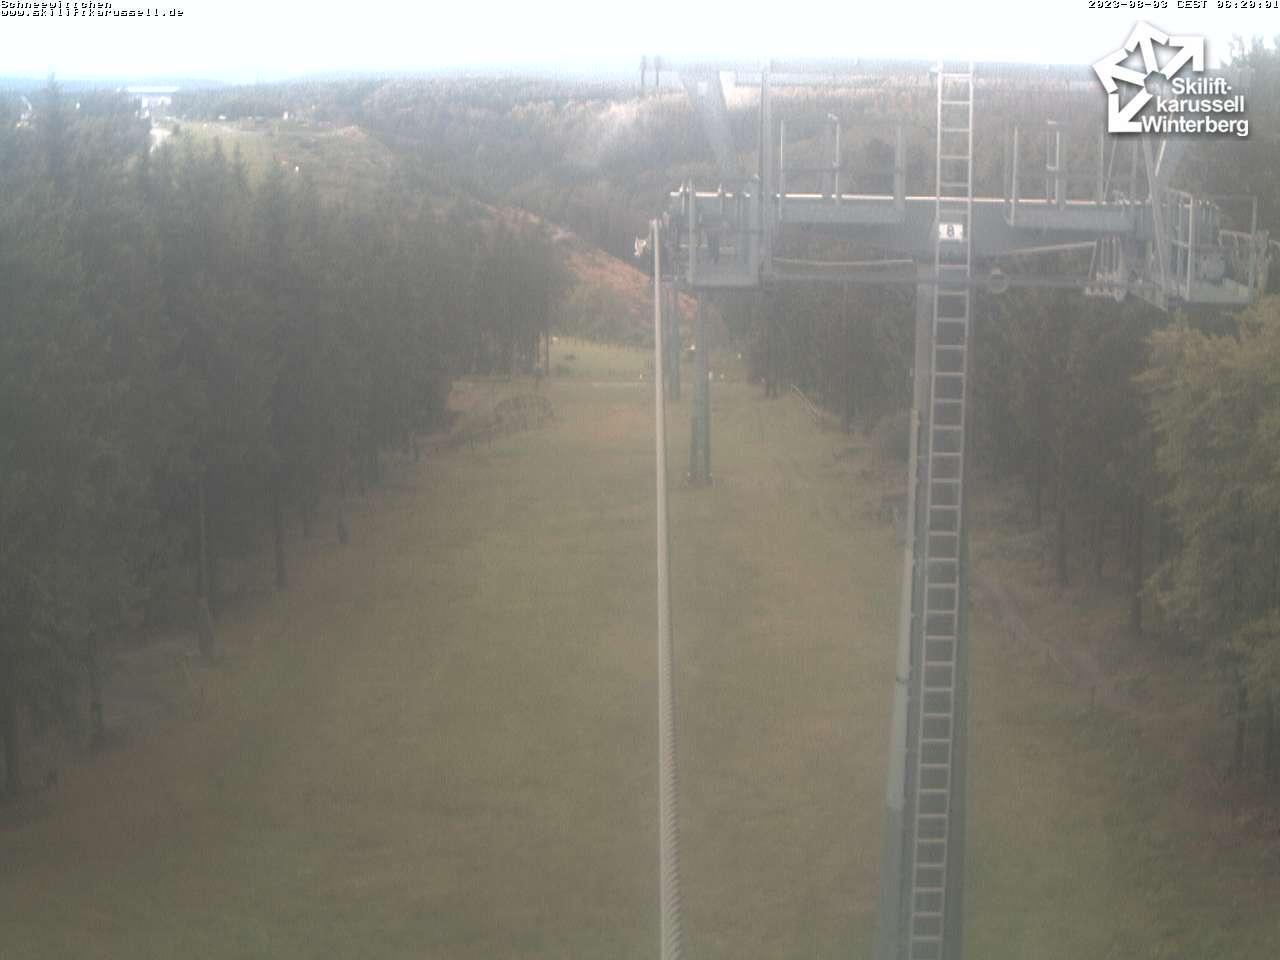 Schneewittchenhang